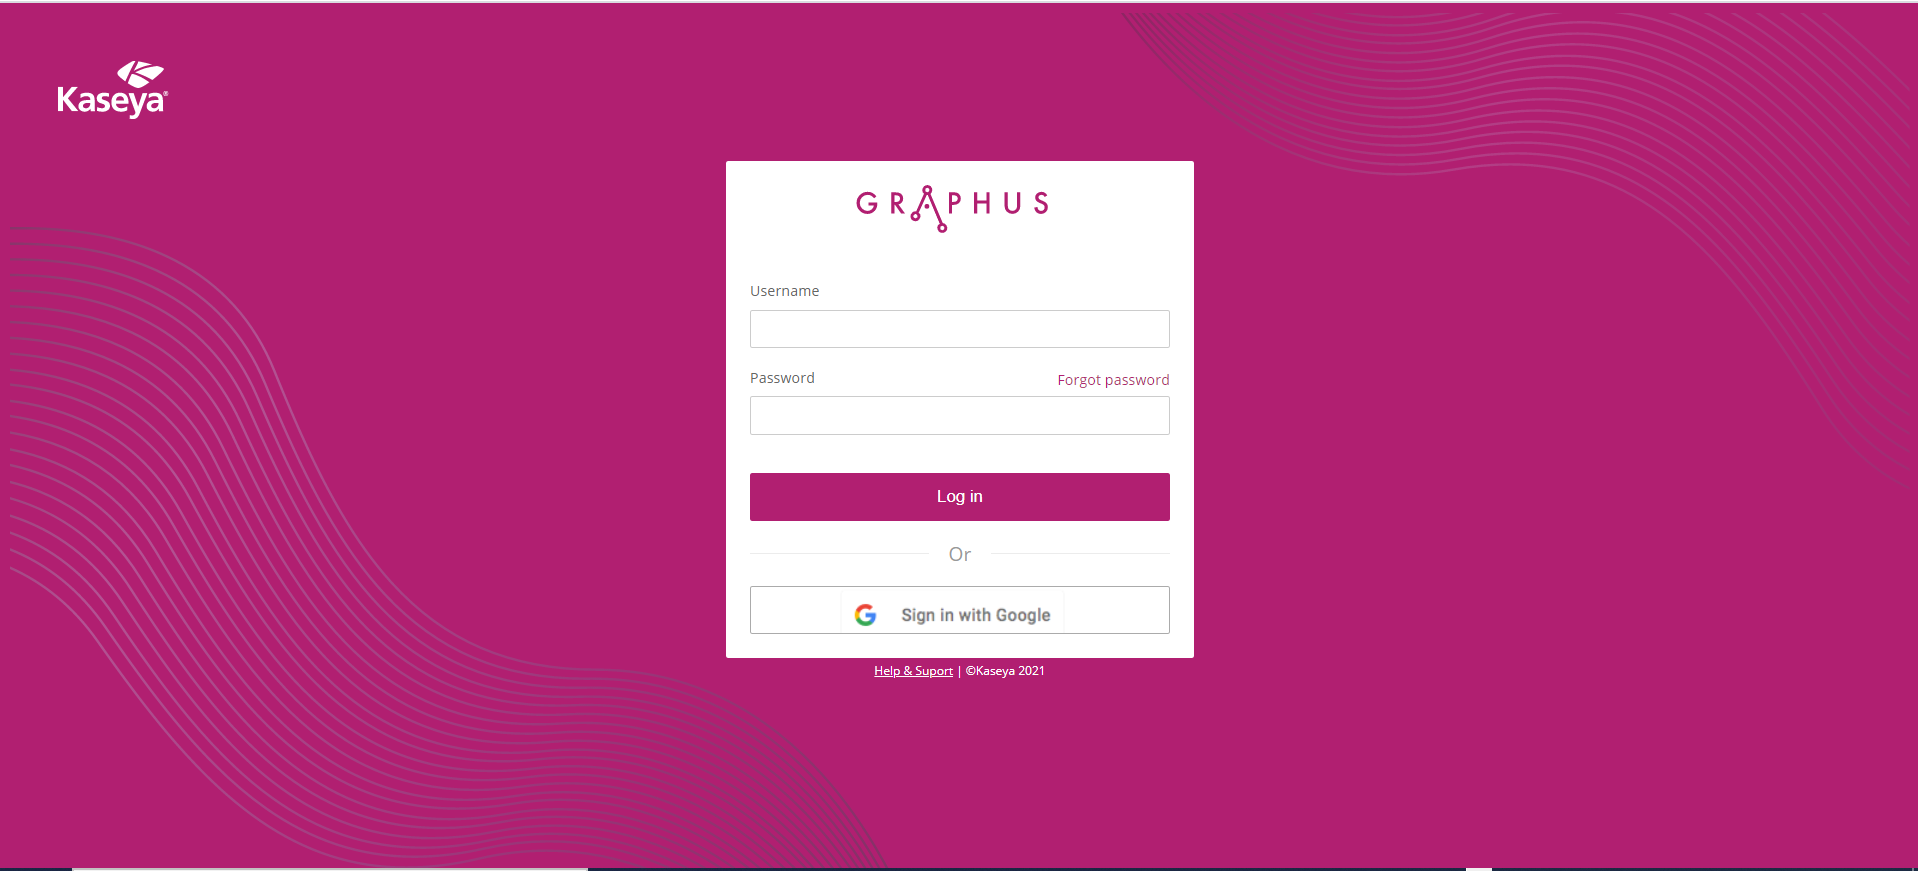 graphus_loginscreen.PNG